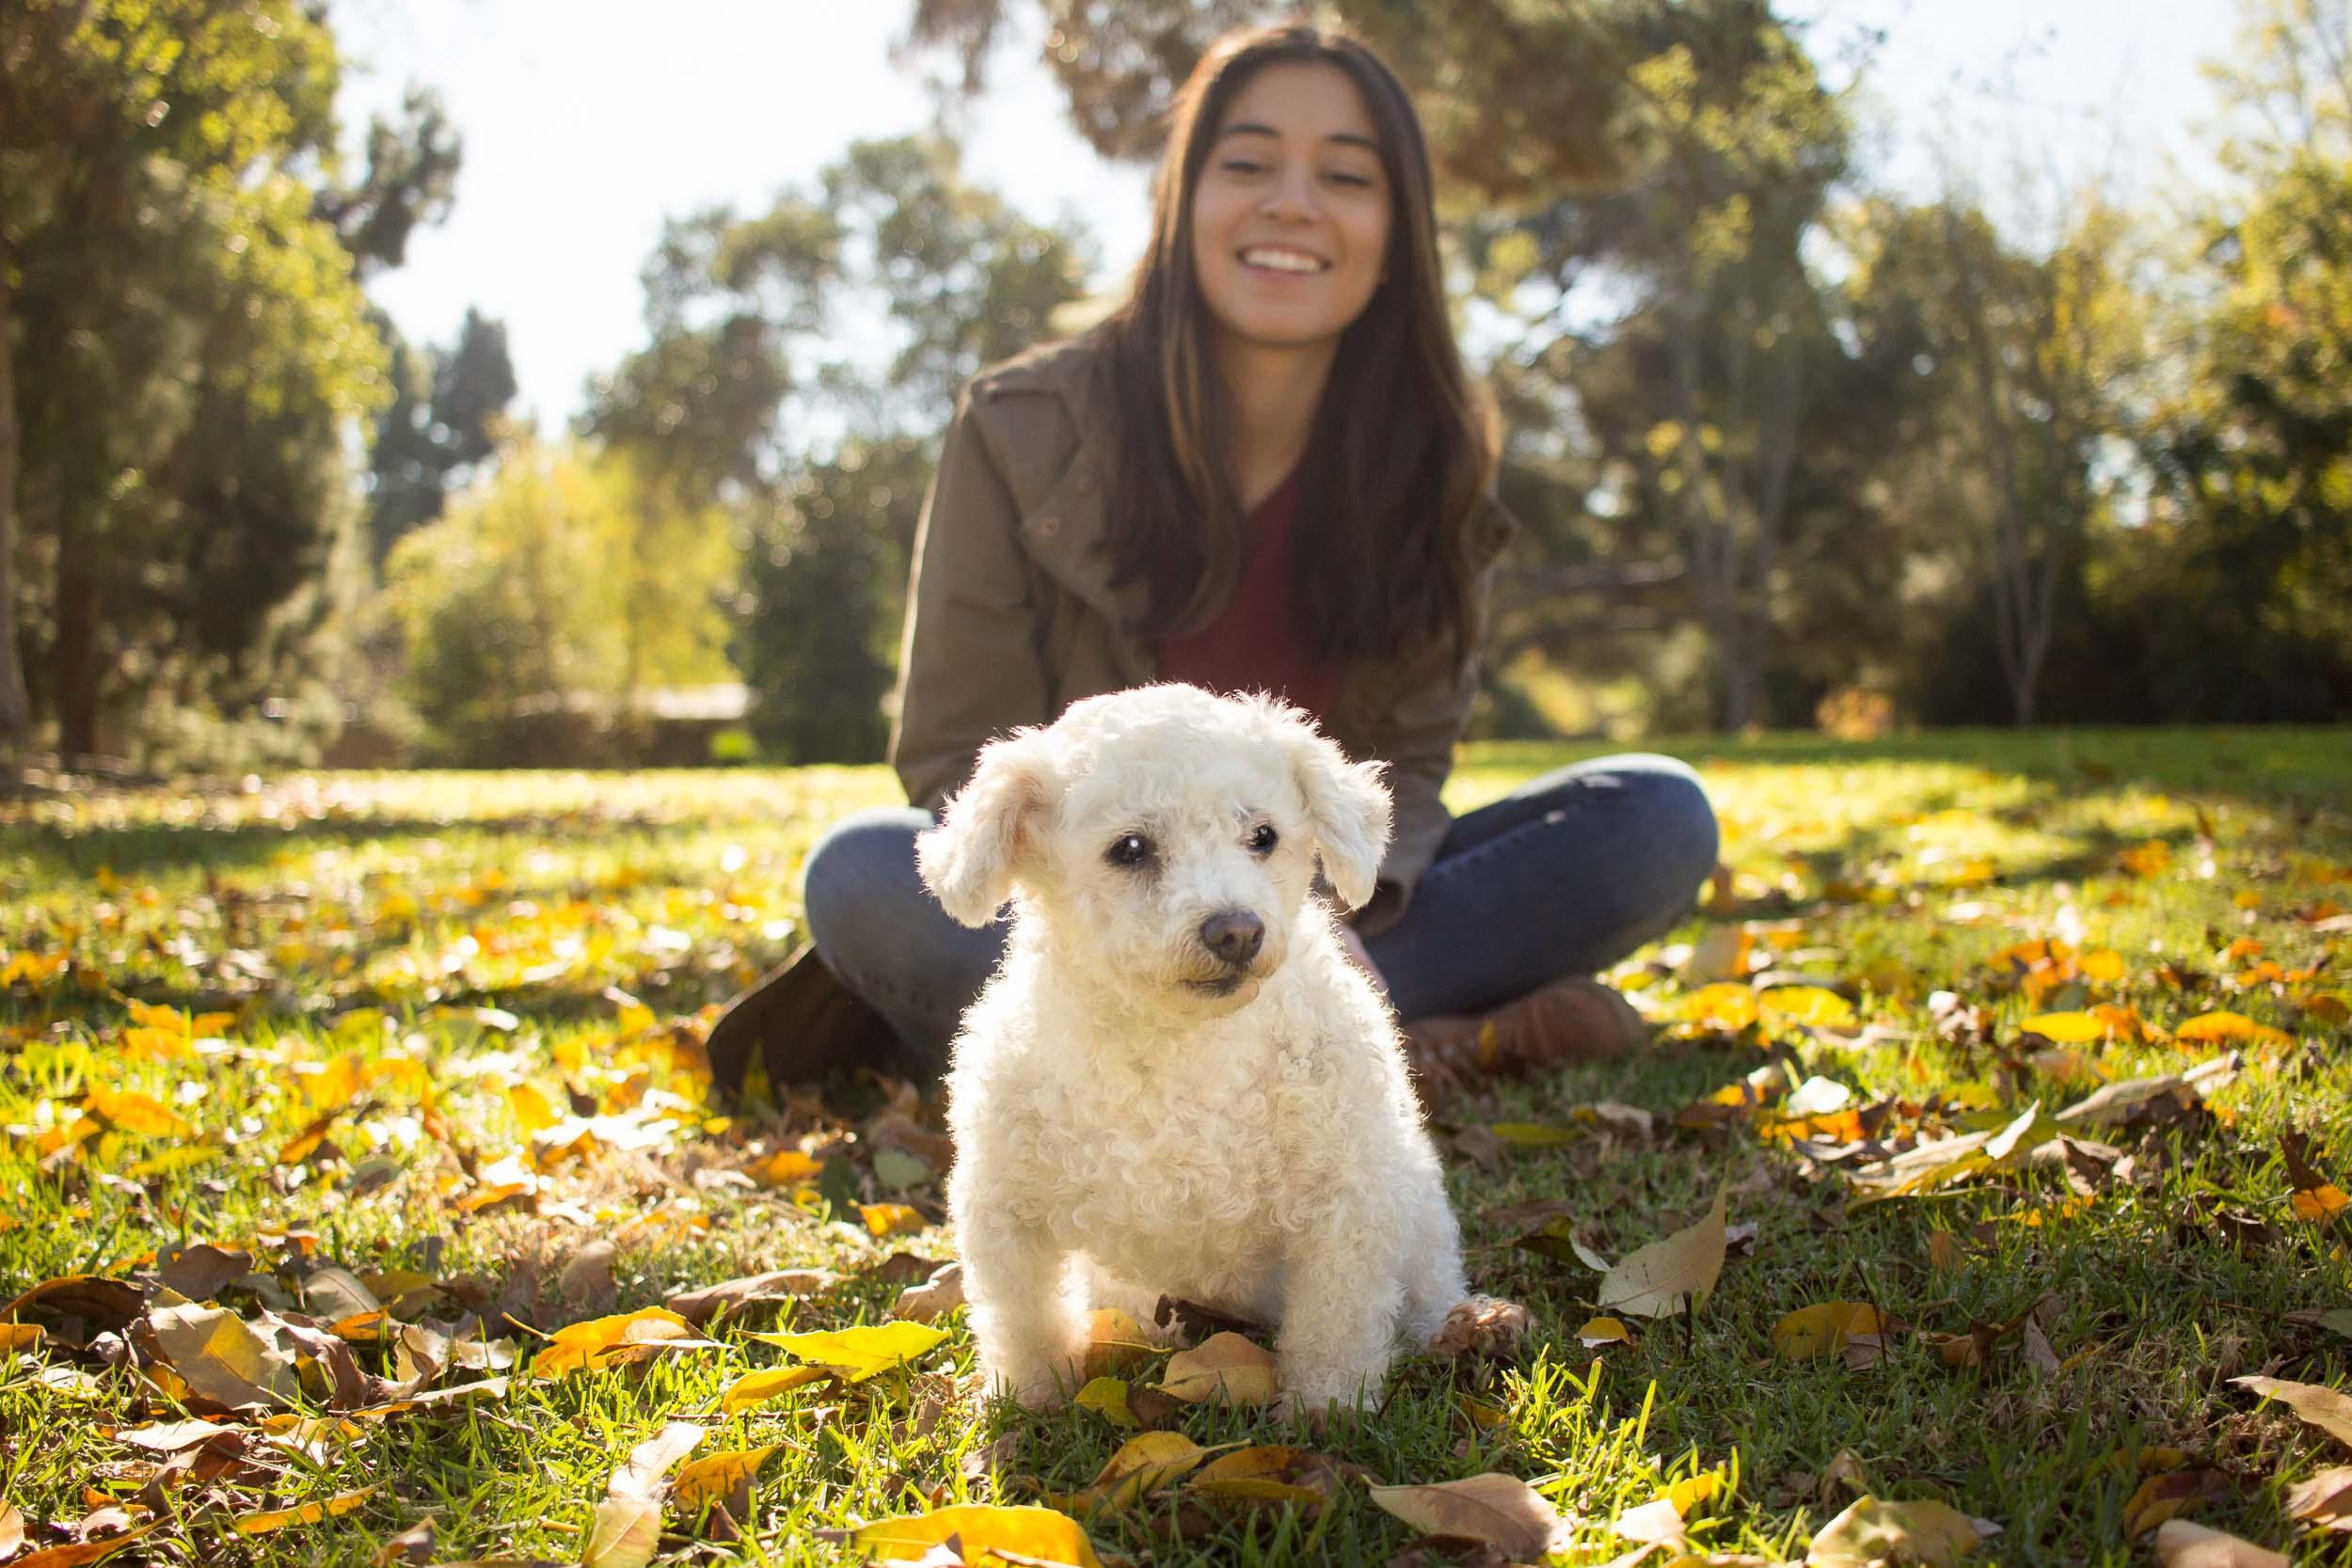 32-Orange-County-Dog-Photographer-Southern-California-Steamer-Lee.JPG